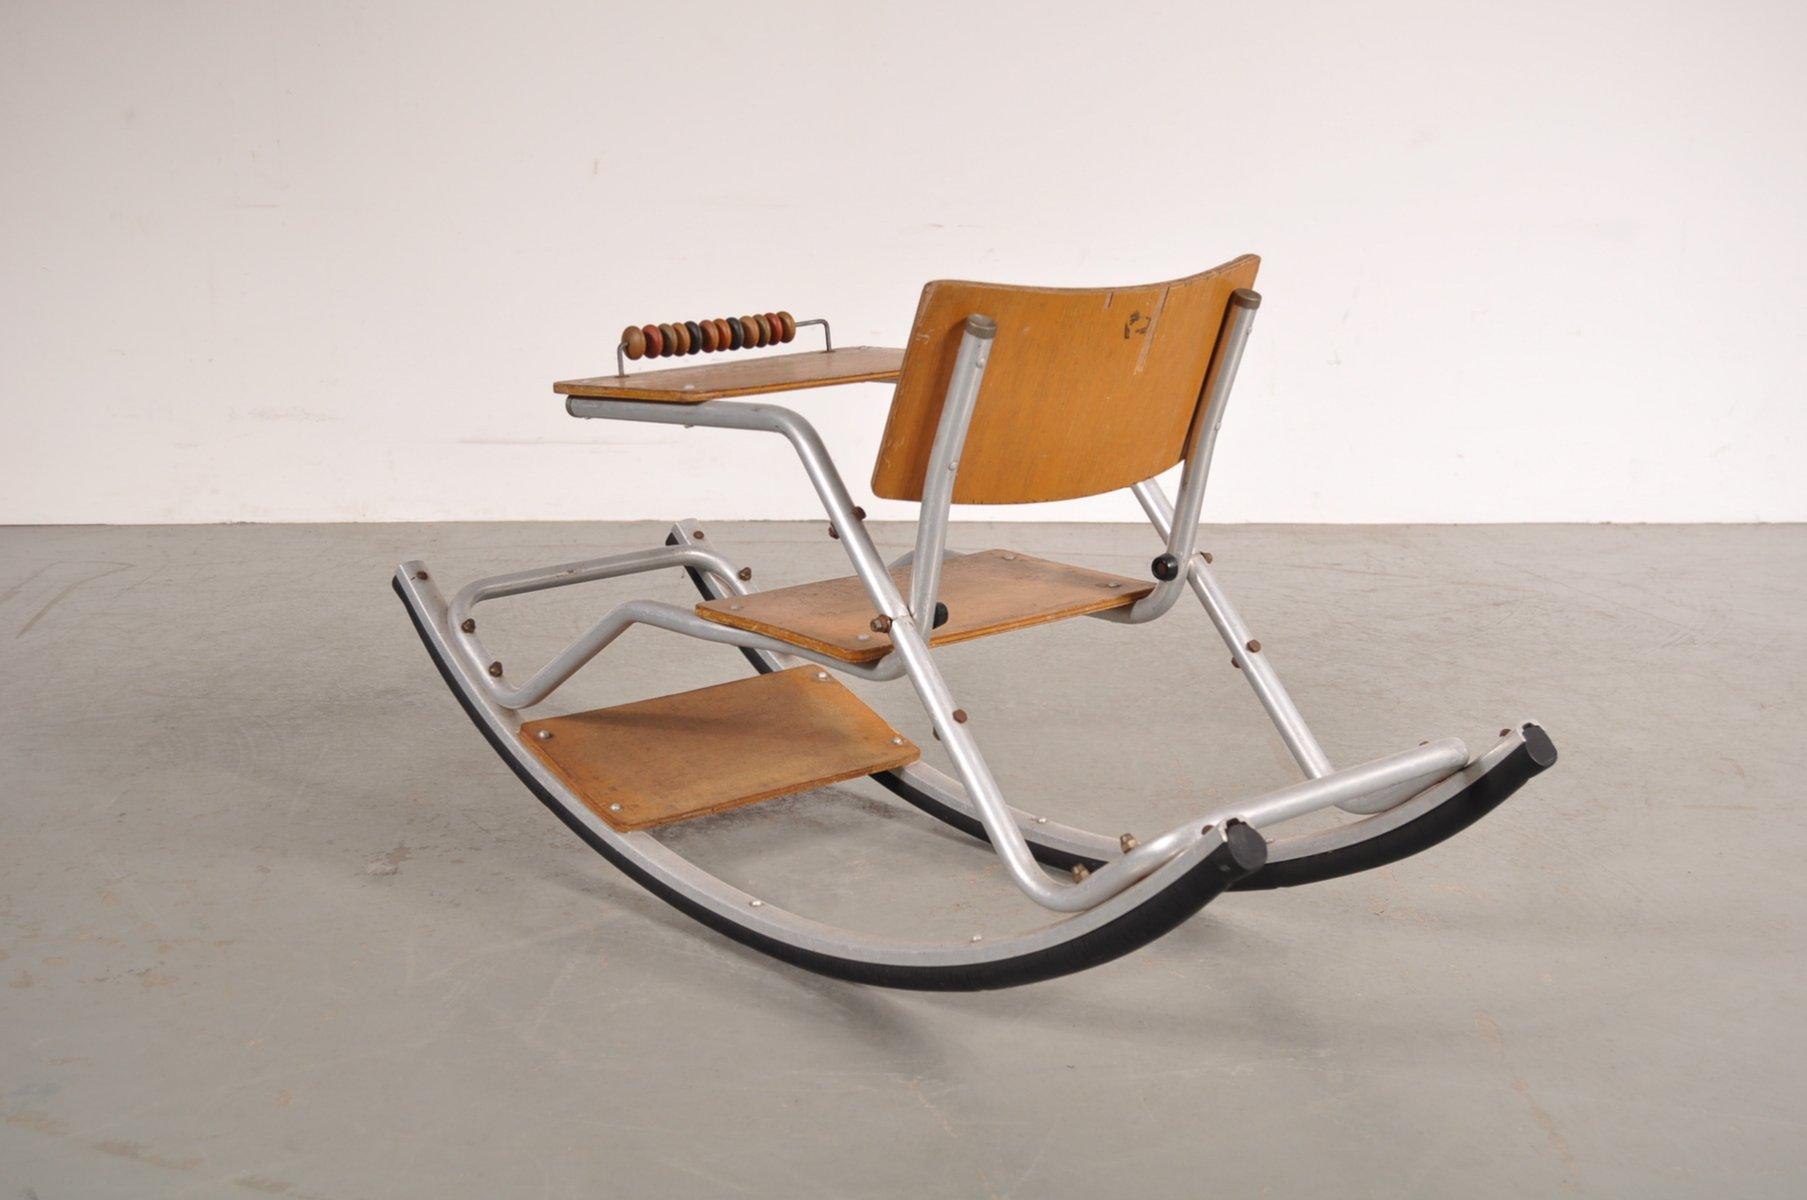 kinder schaukelstuhl auf aluminium gestell 1950er bei pamono kaufen. Black Bedroom Furniture Sets. Home Design Ideas